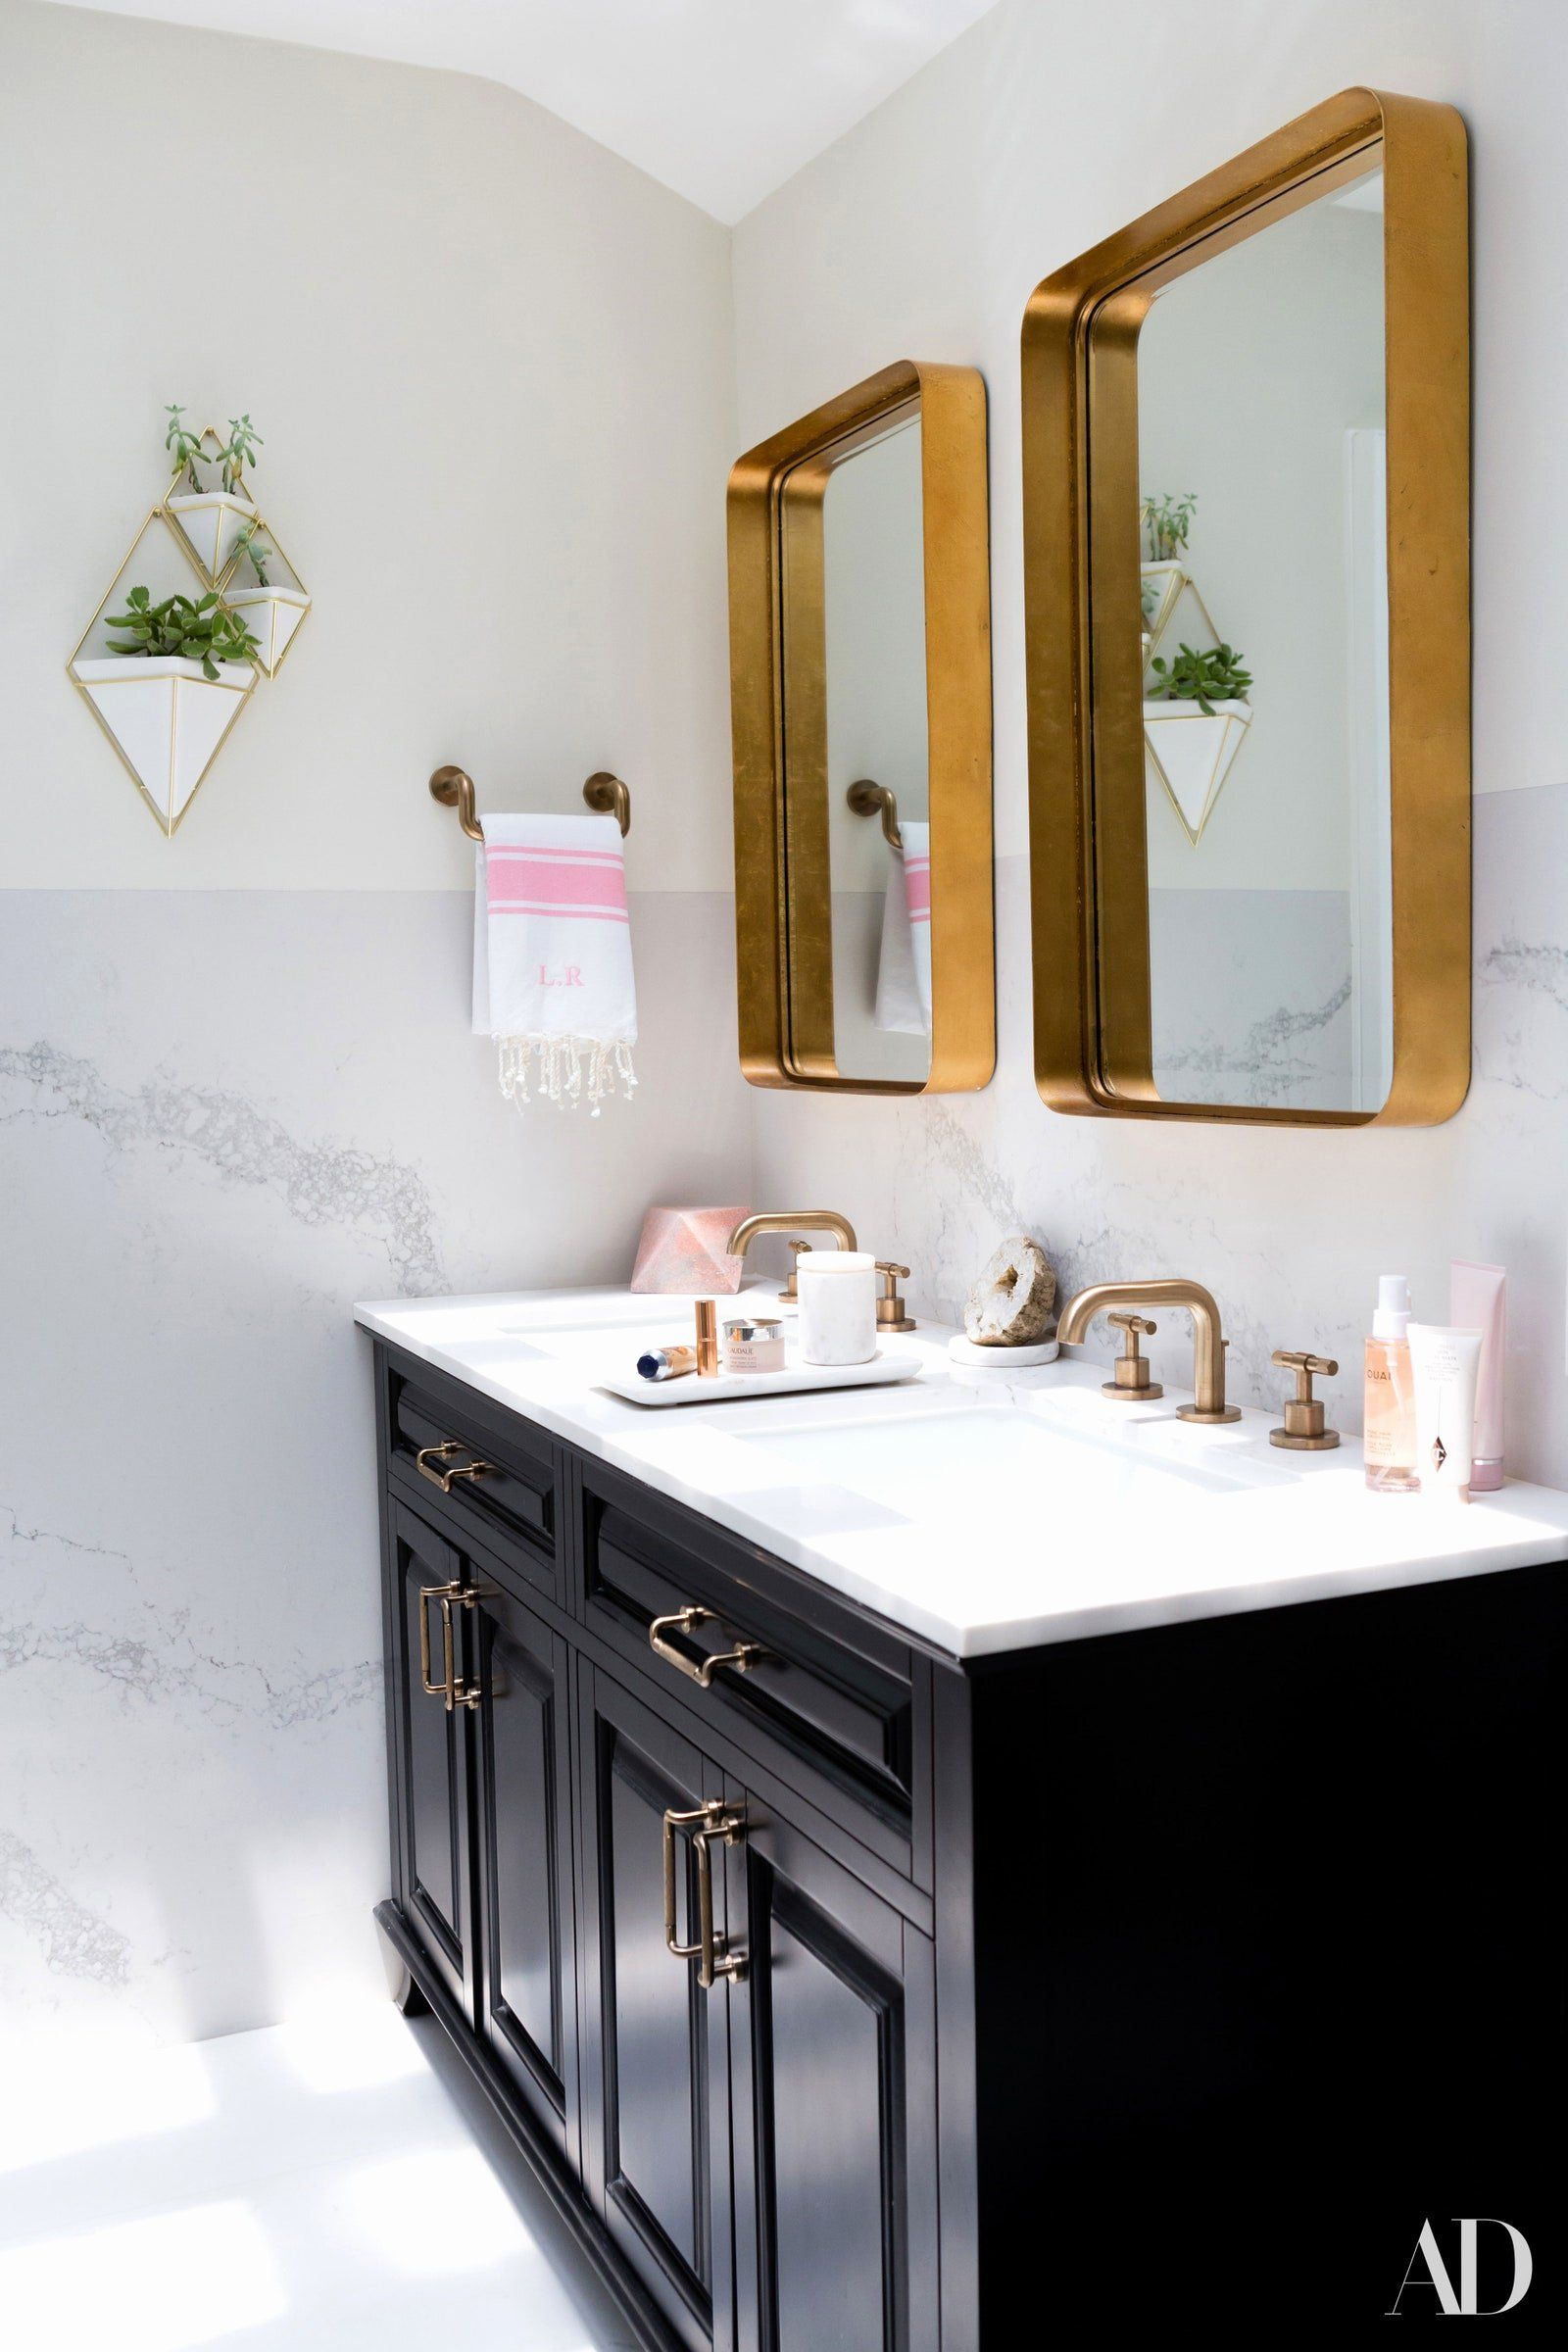 Small Bathroom Mirror Ideas Inspirational Bathroom Mirror Designs India Kumpalorkersydnorhistoric In 2020 Elegant Bathroom Large Bathroom Mirrors Bathroom Decor